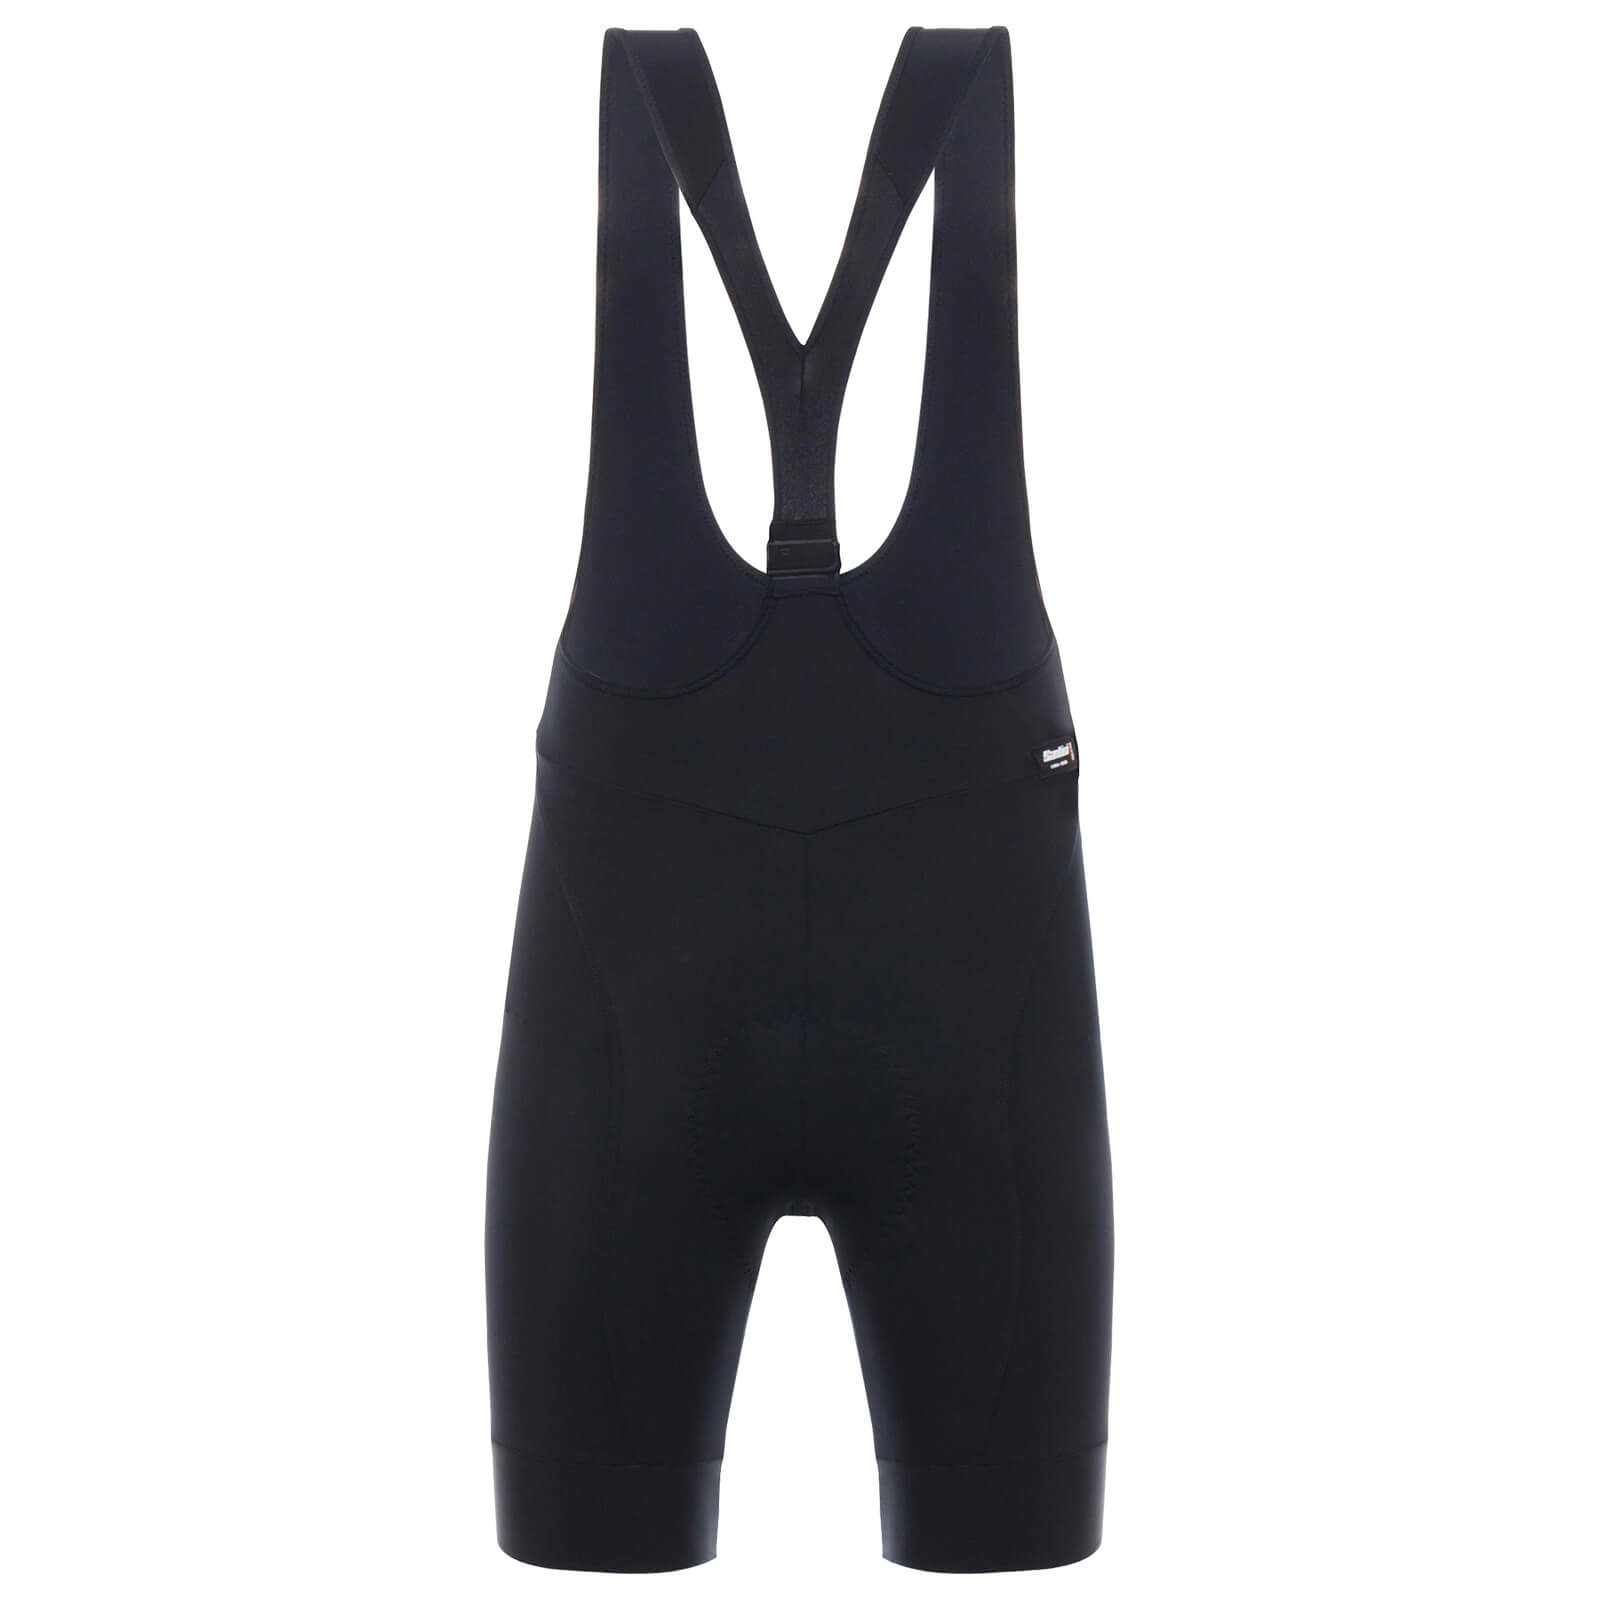 Santini Women's Legend Bib Shorts - M - Black